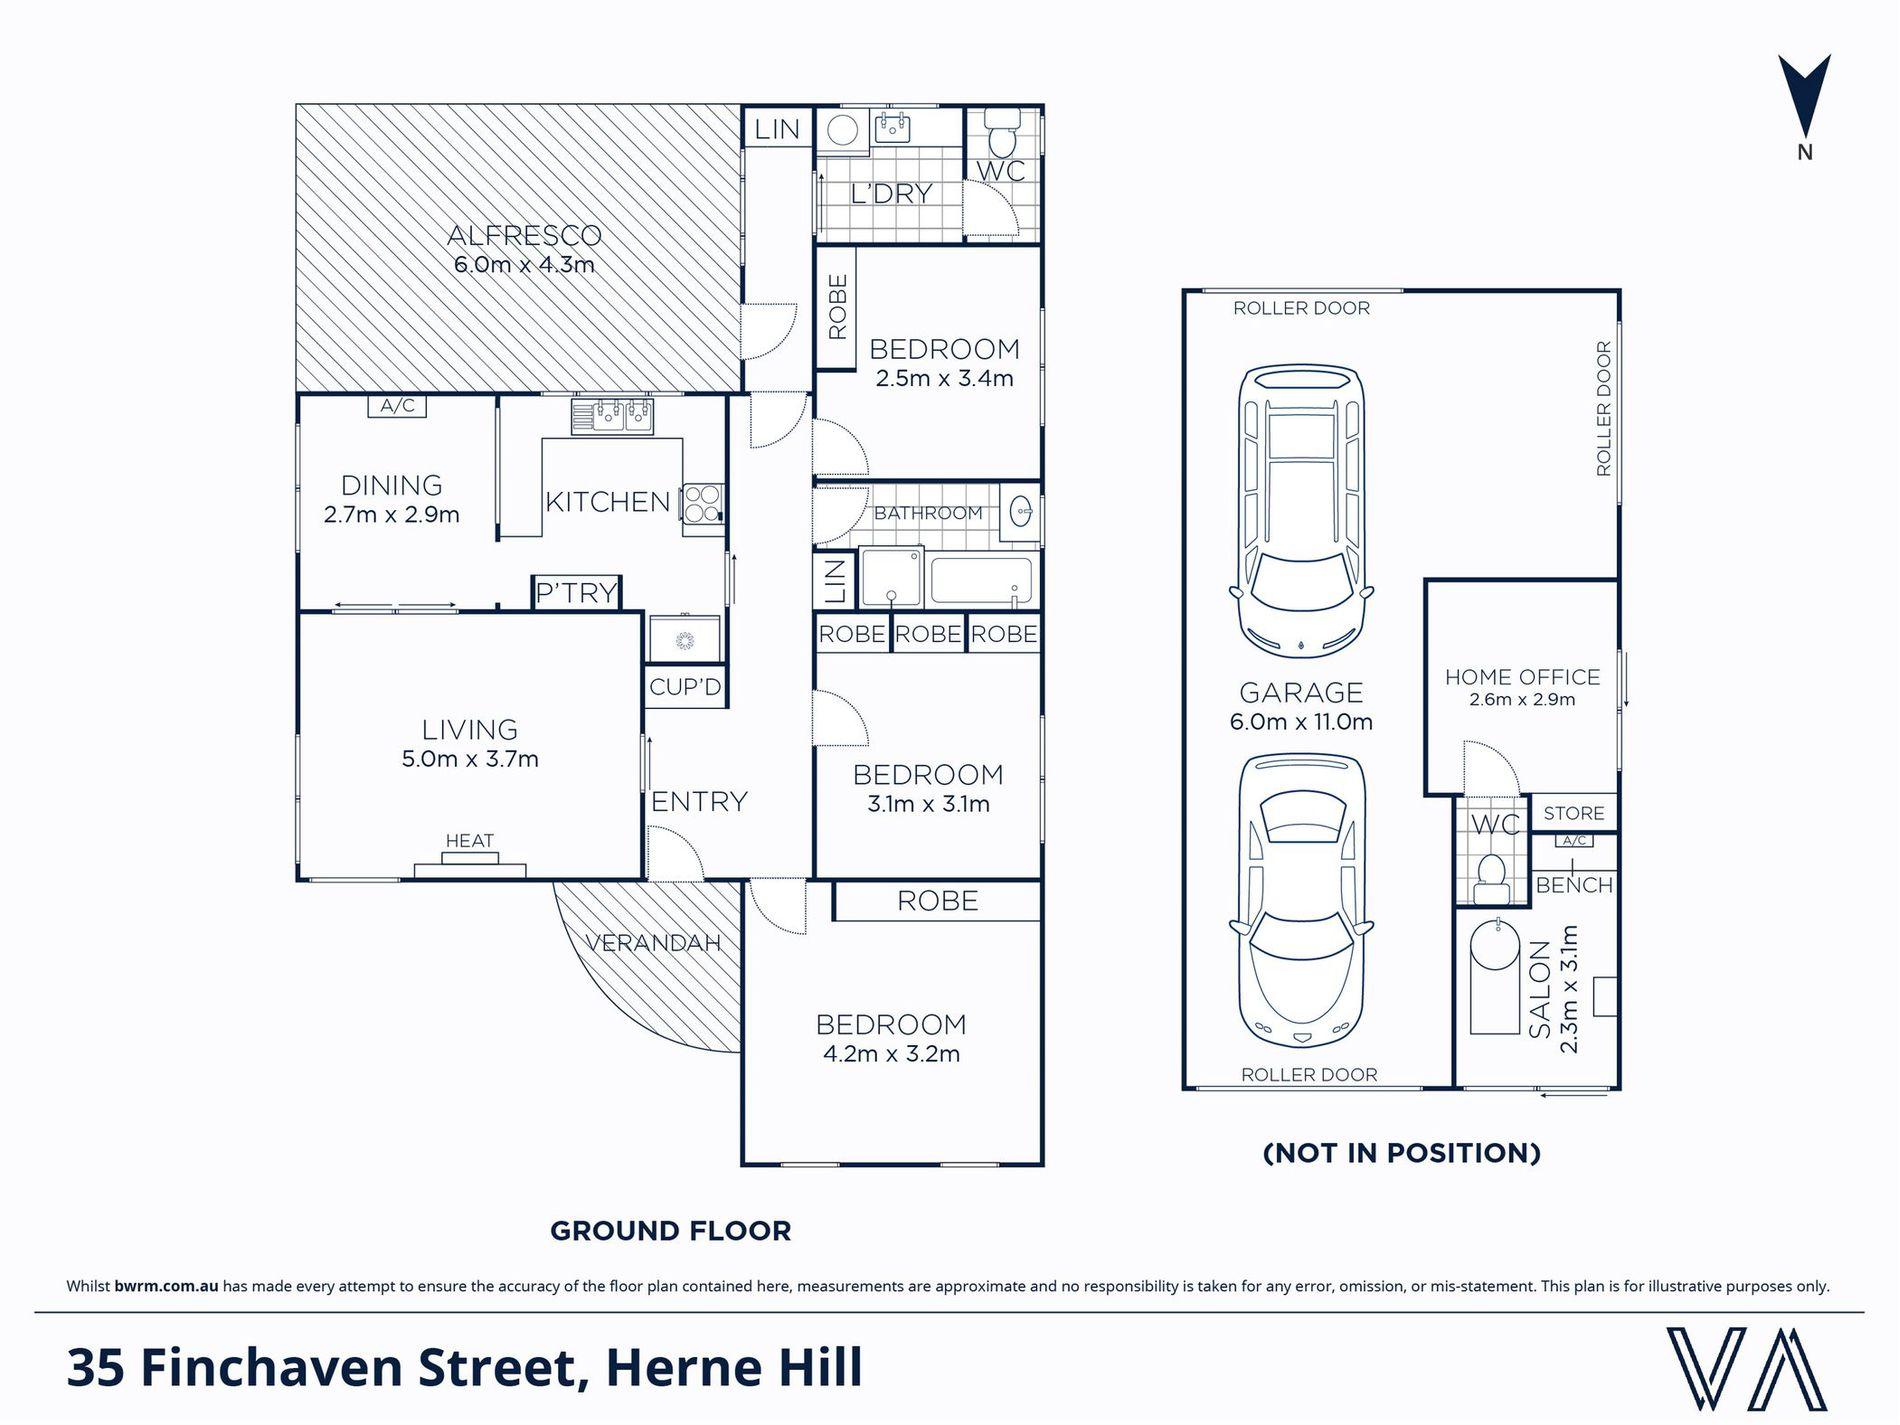 35 Finchaven Street, Herne Hill